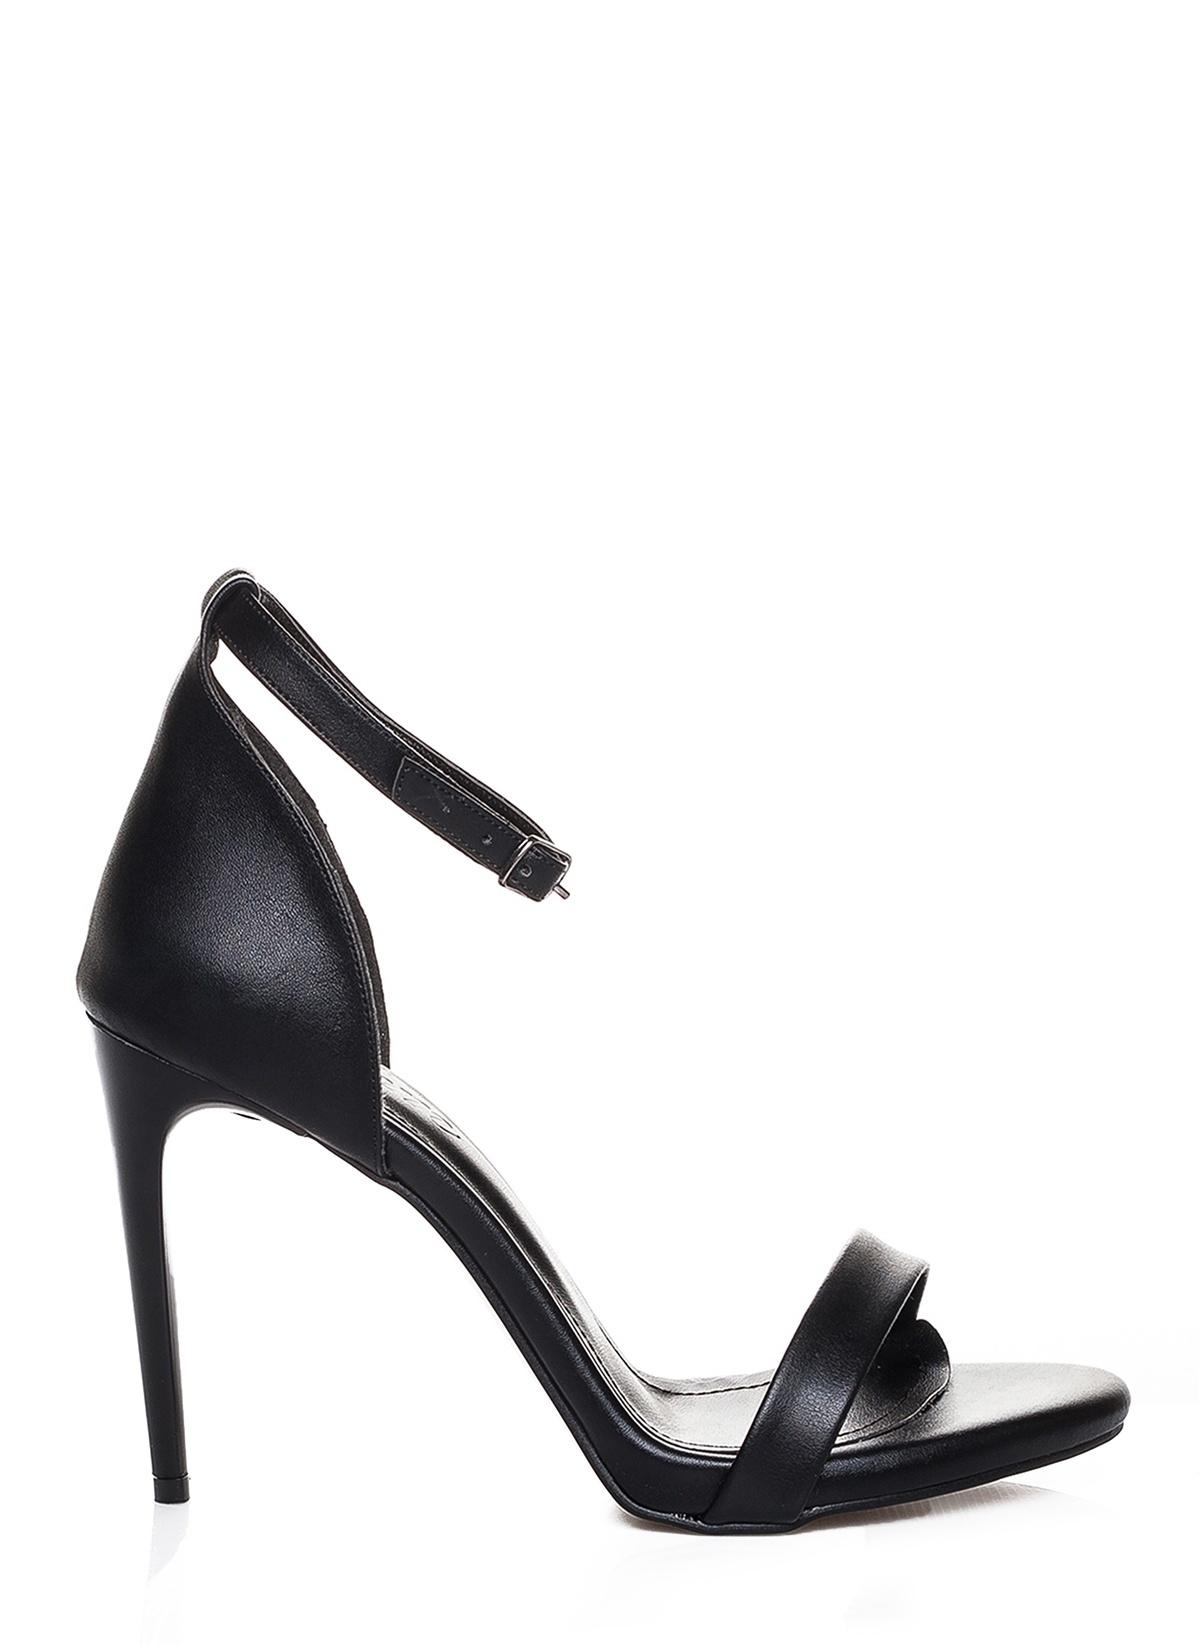 Efem Ayakkabı 19yefem903004 Stiletto – 139.9 TL